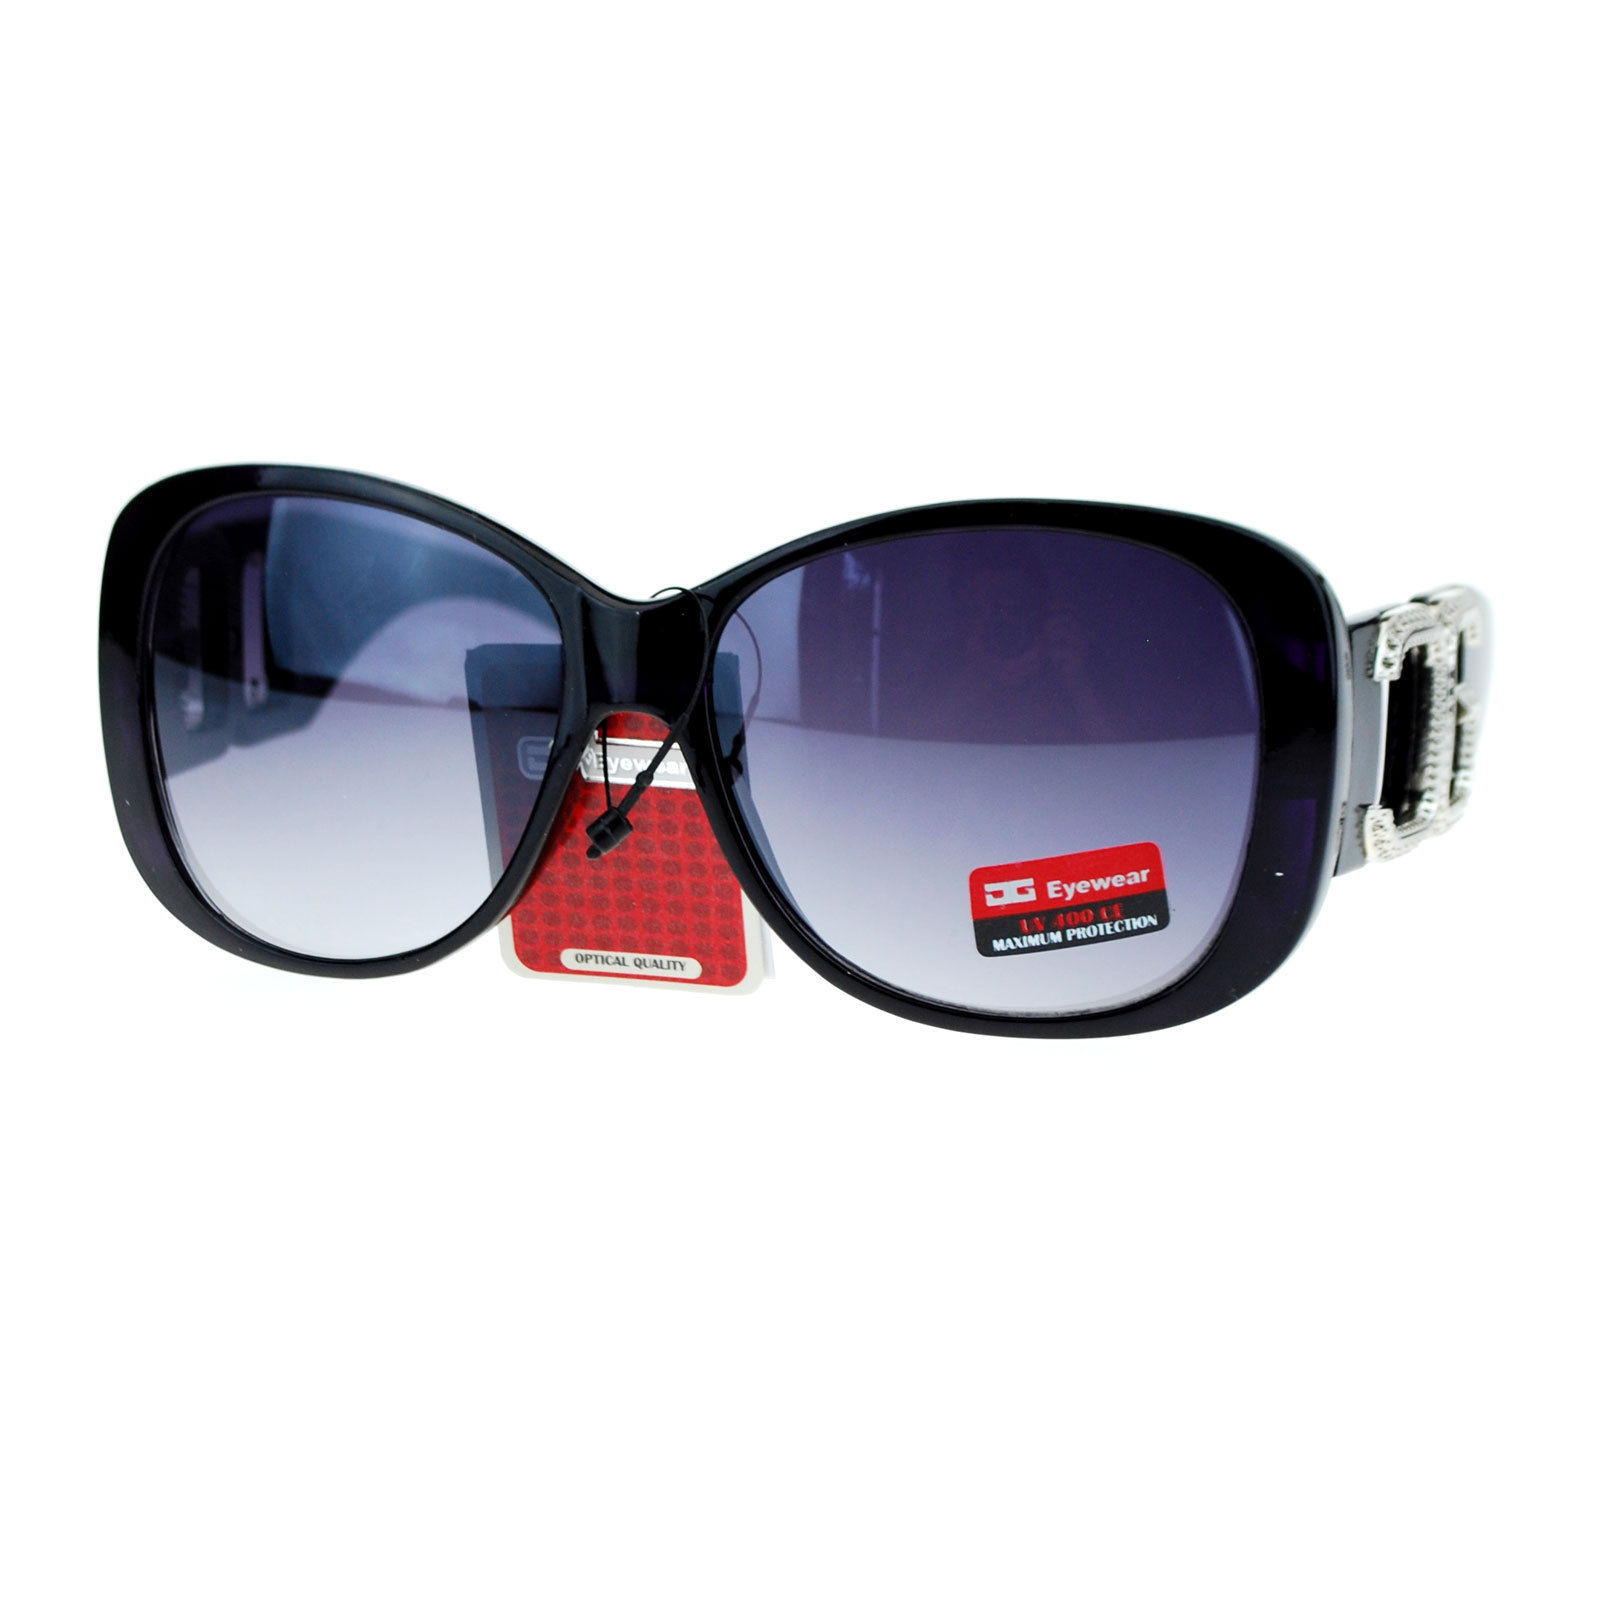 CG Eyewear Womens Sunglasses Classic Designer Fashion Frame